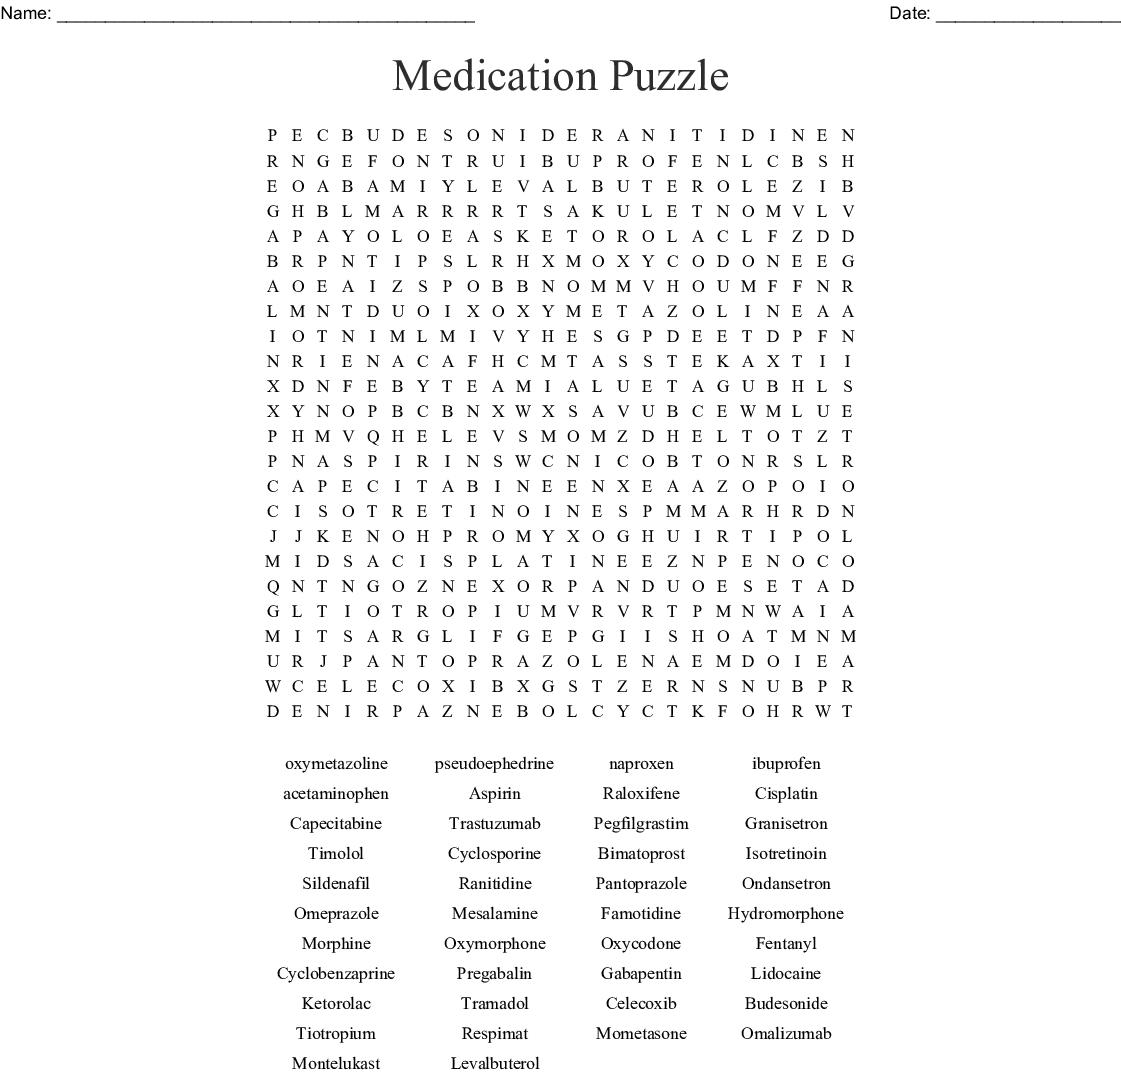 drugs  u0026 medications crosswords  word searches  bingo cards